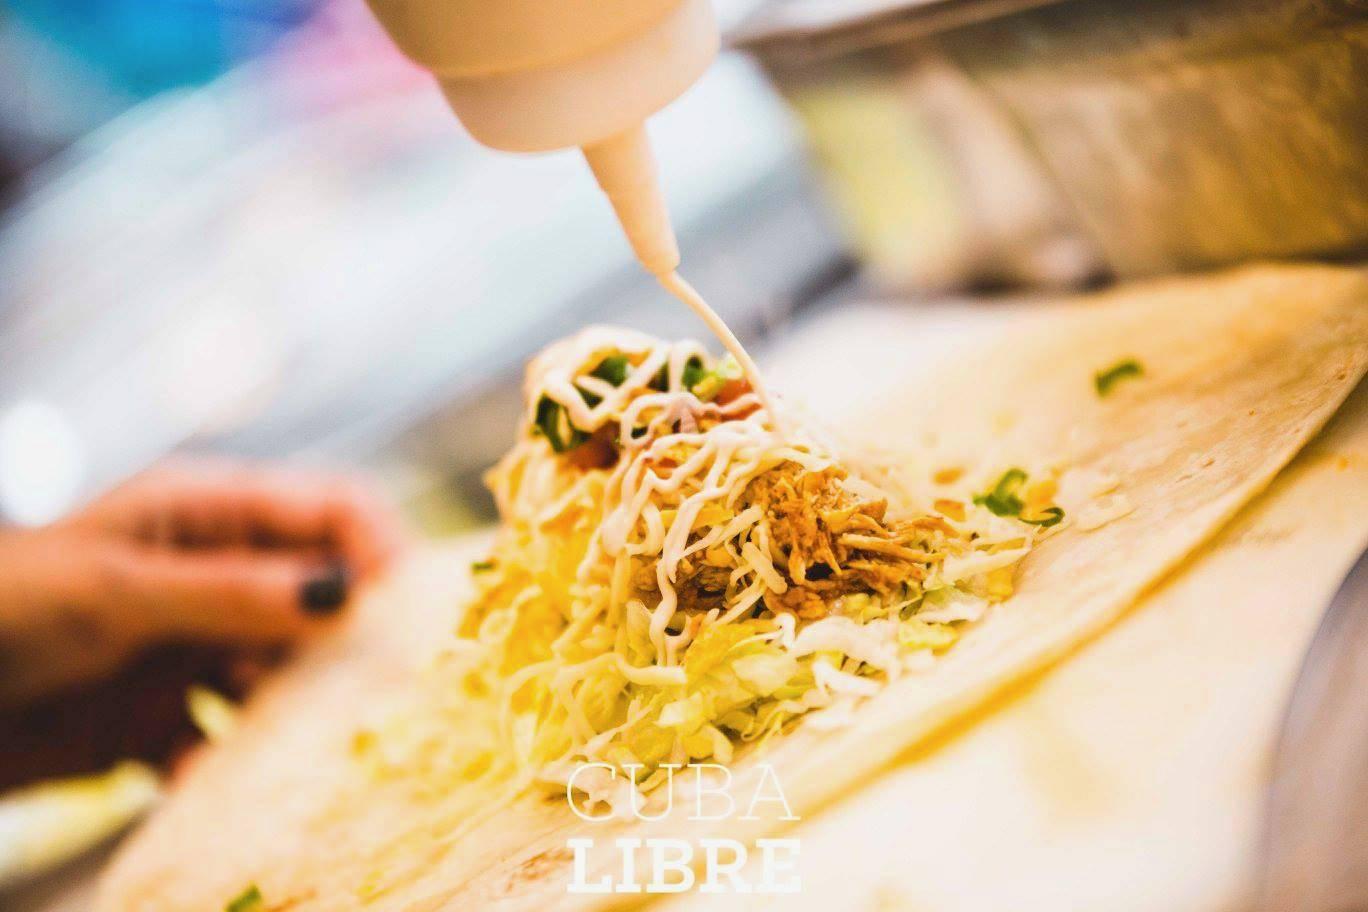 Up Pepper - foodtruck - House of Weddings 2 - 6